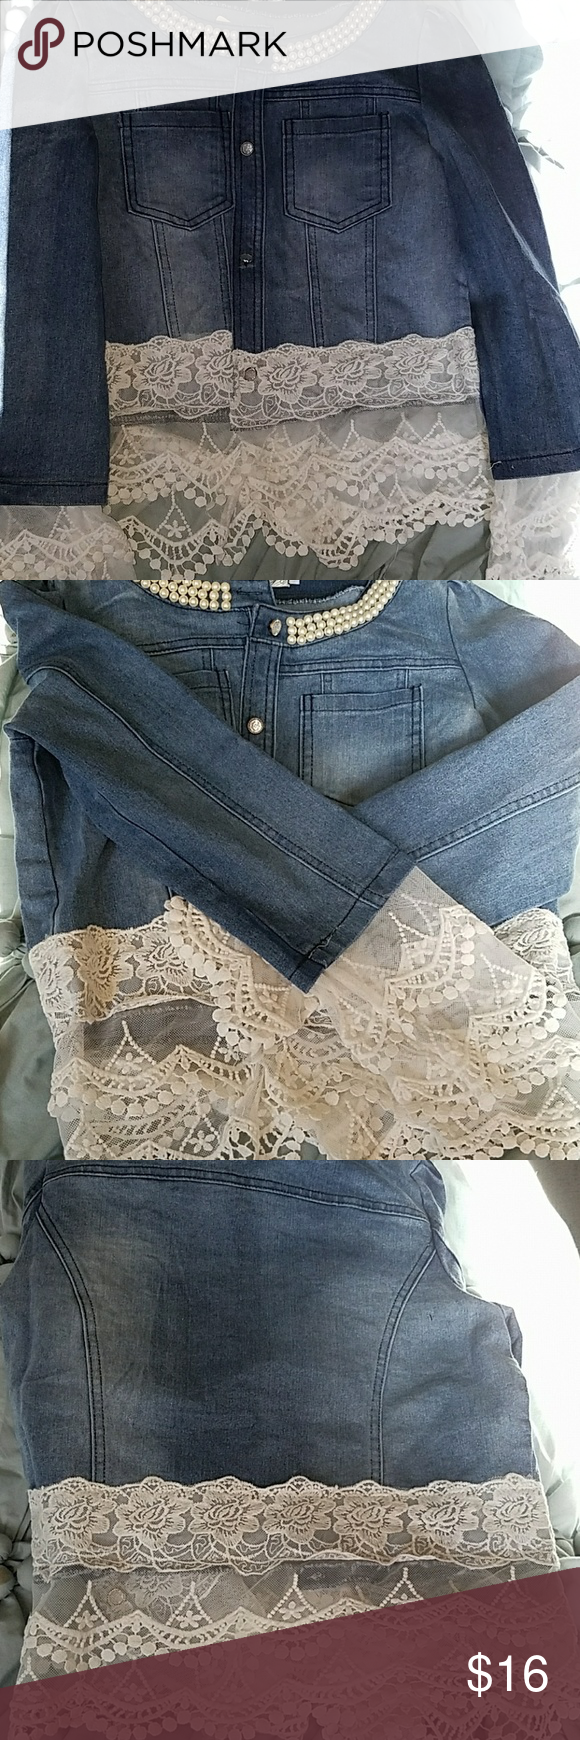 Lace denim jacket A really cute lace denim jacket Jackets & Coats Jean Jackets